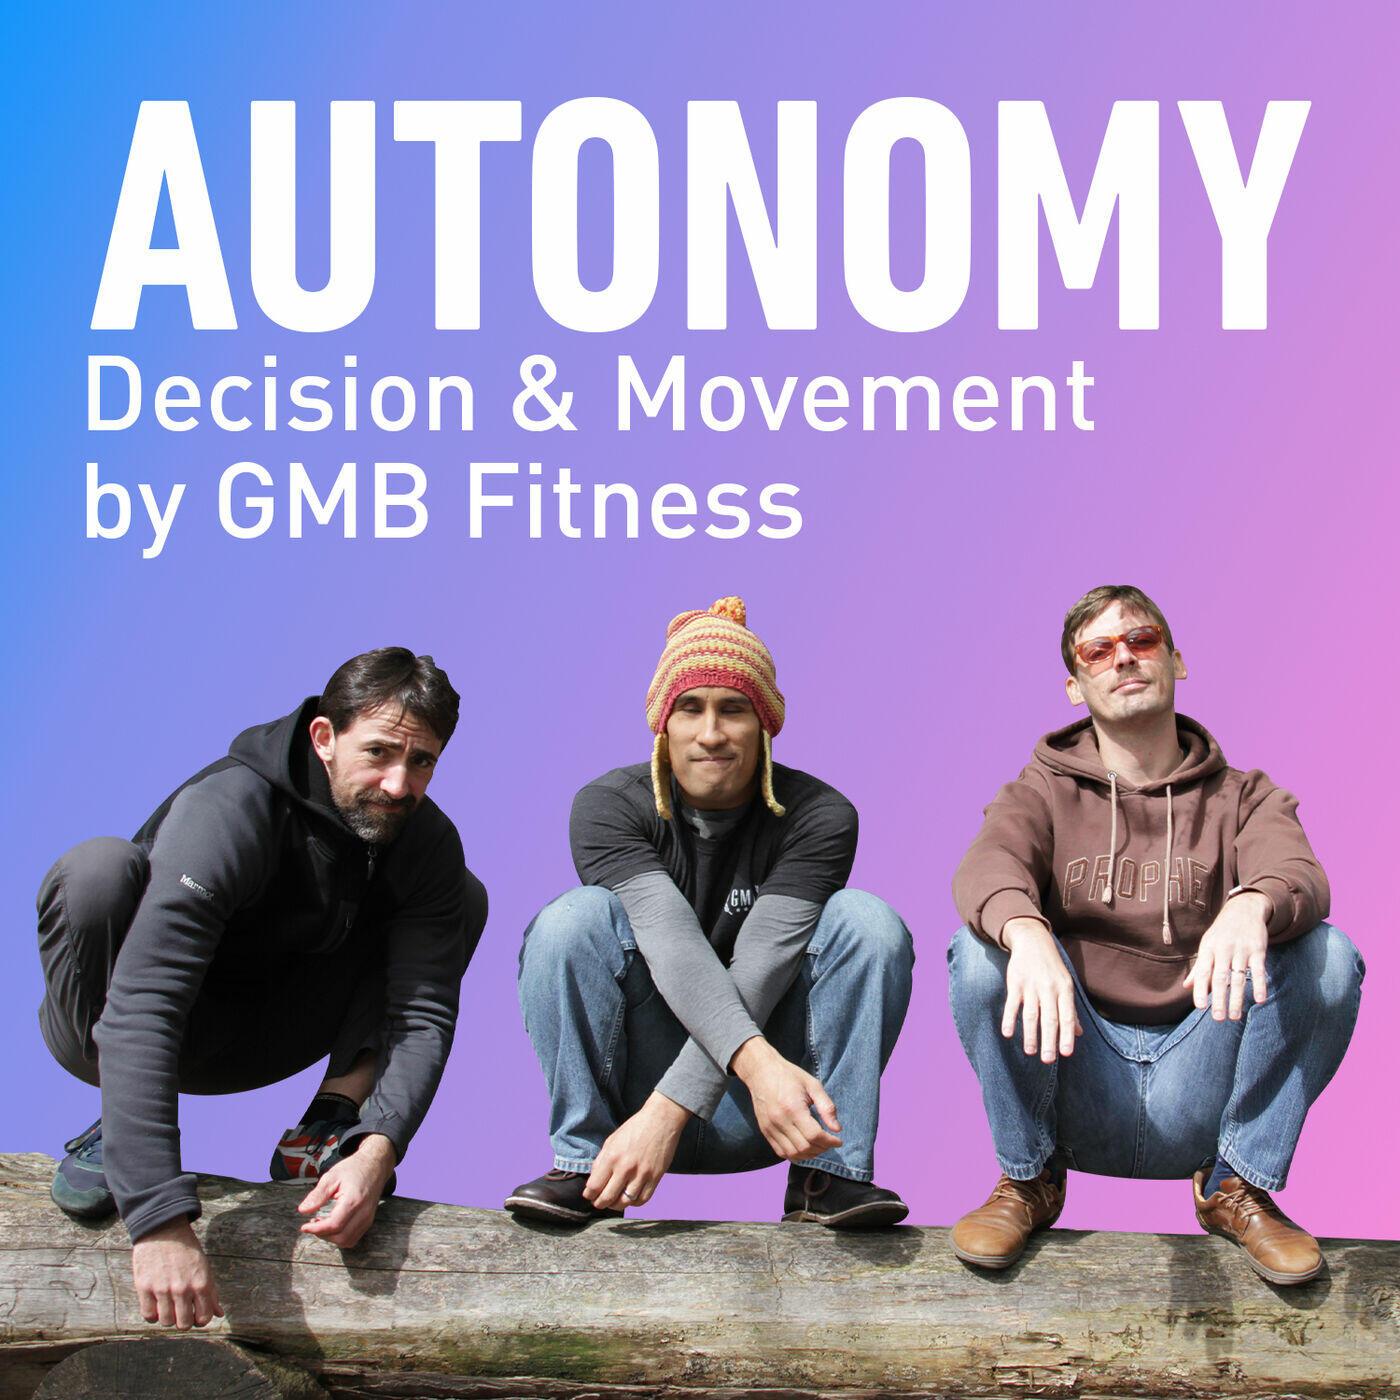 Autonomy 🤸♂️🍔✊ GMB Fitness